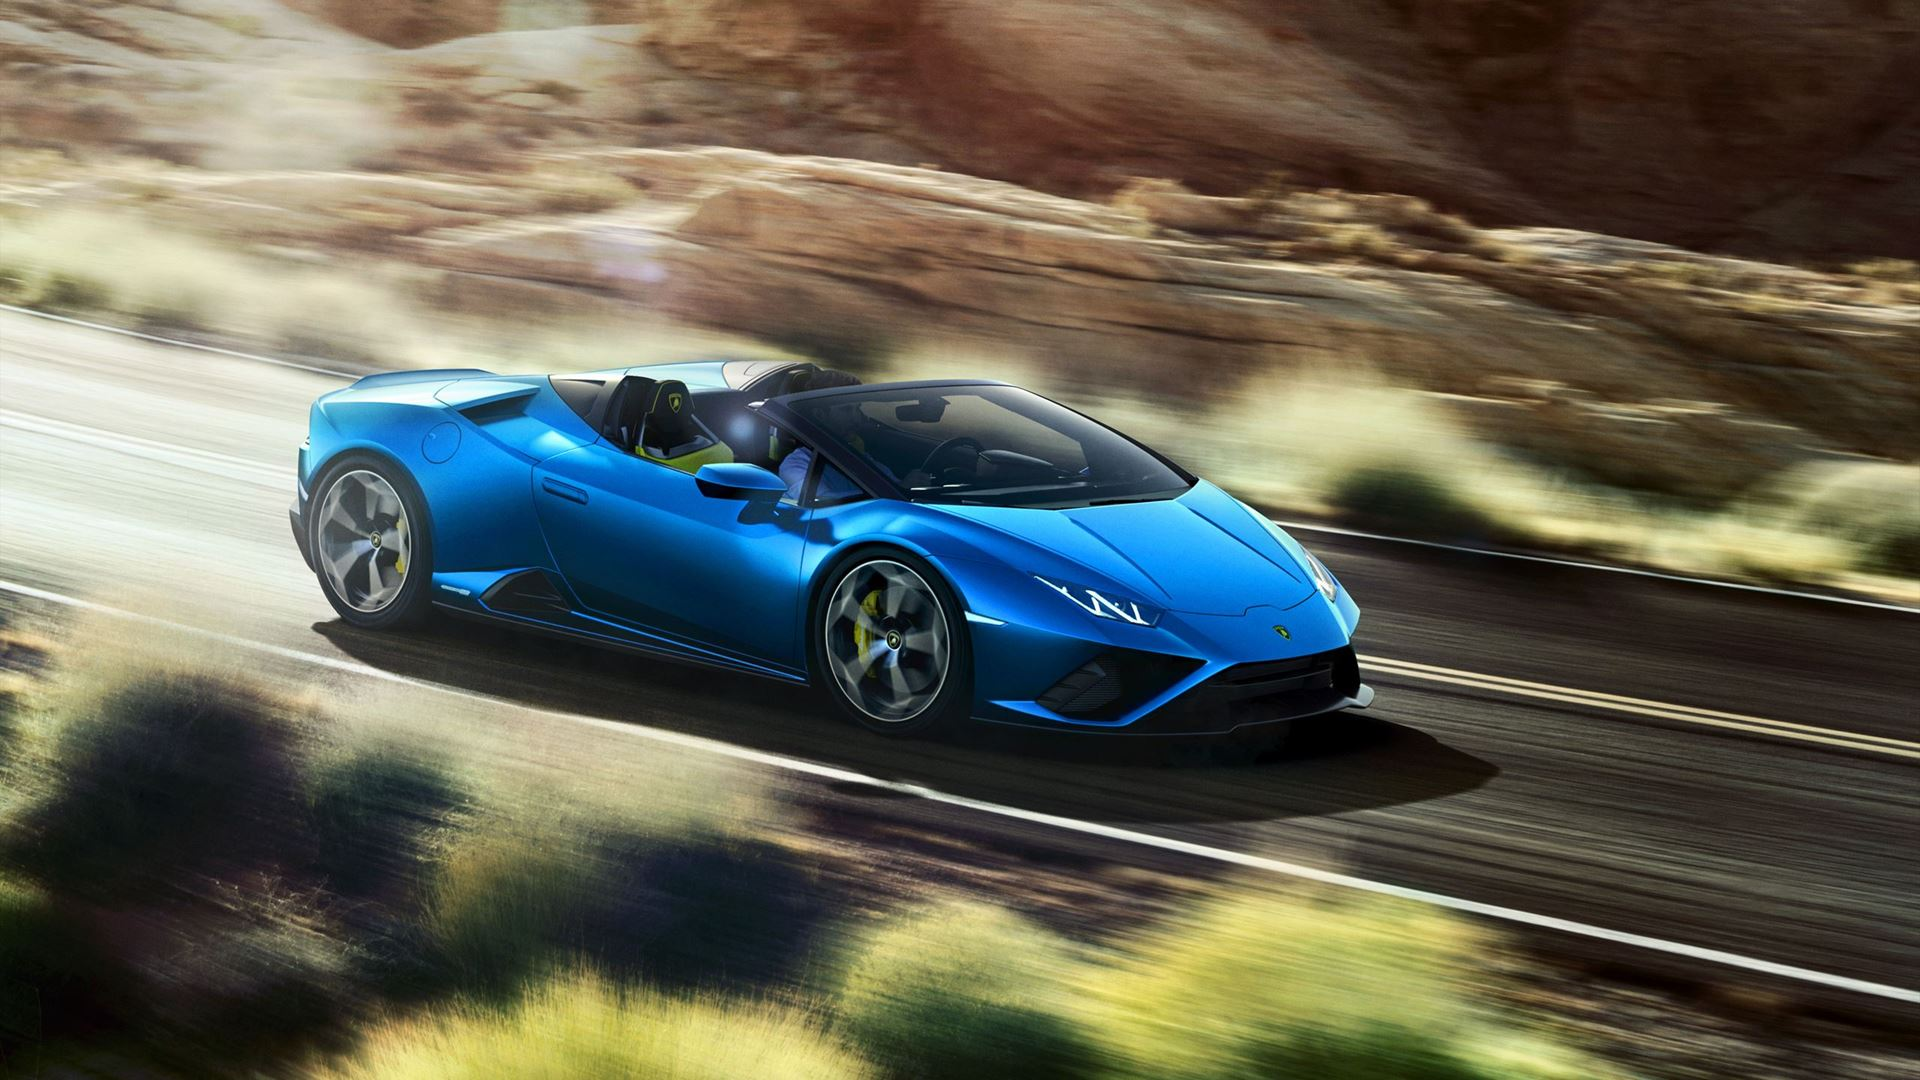 A record September for Automobili Lamborghini - Image 5